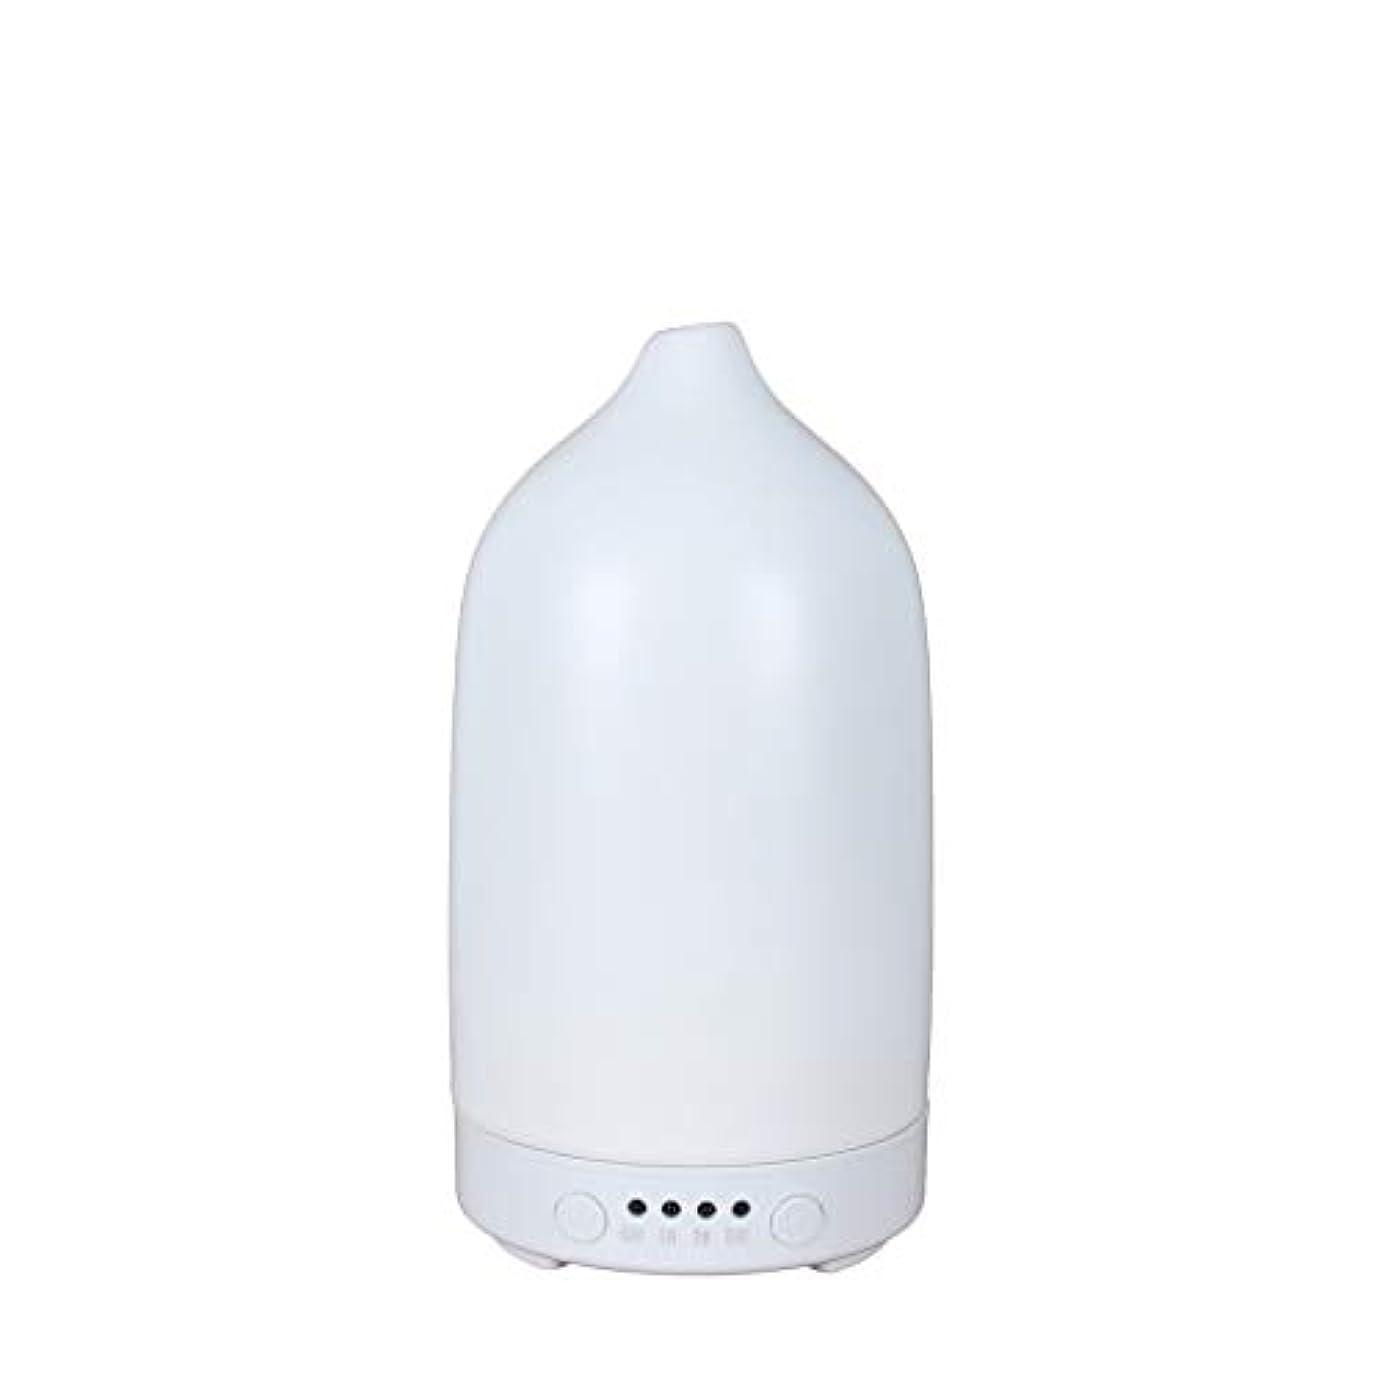 保持する郵便花火加湿器卓上USB型加湿器殺菌加湿エアーフレッシュナー落下水漏れ防止超音波式加湿器超音波式卓上型大容量超静音長時間連続運転乾燥対策調整可能なミストブロー消音 (A)